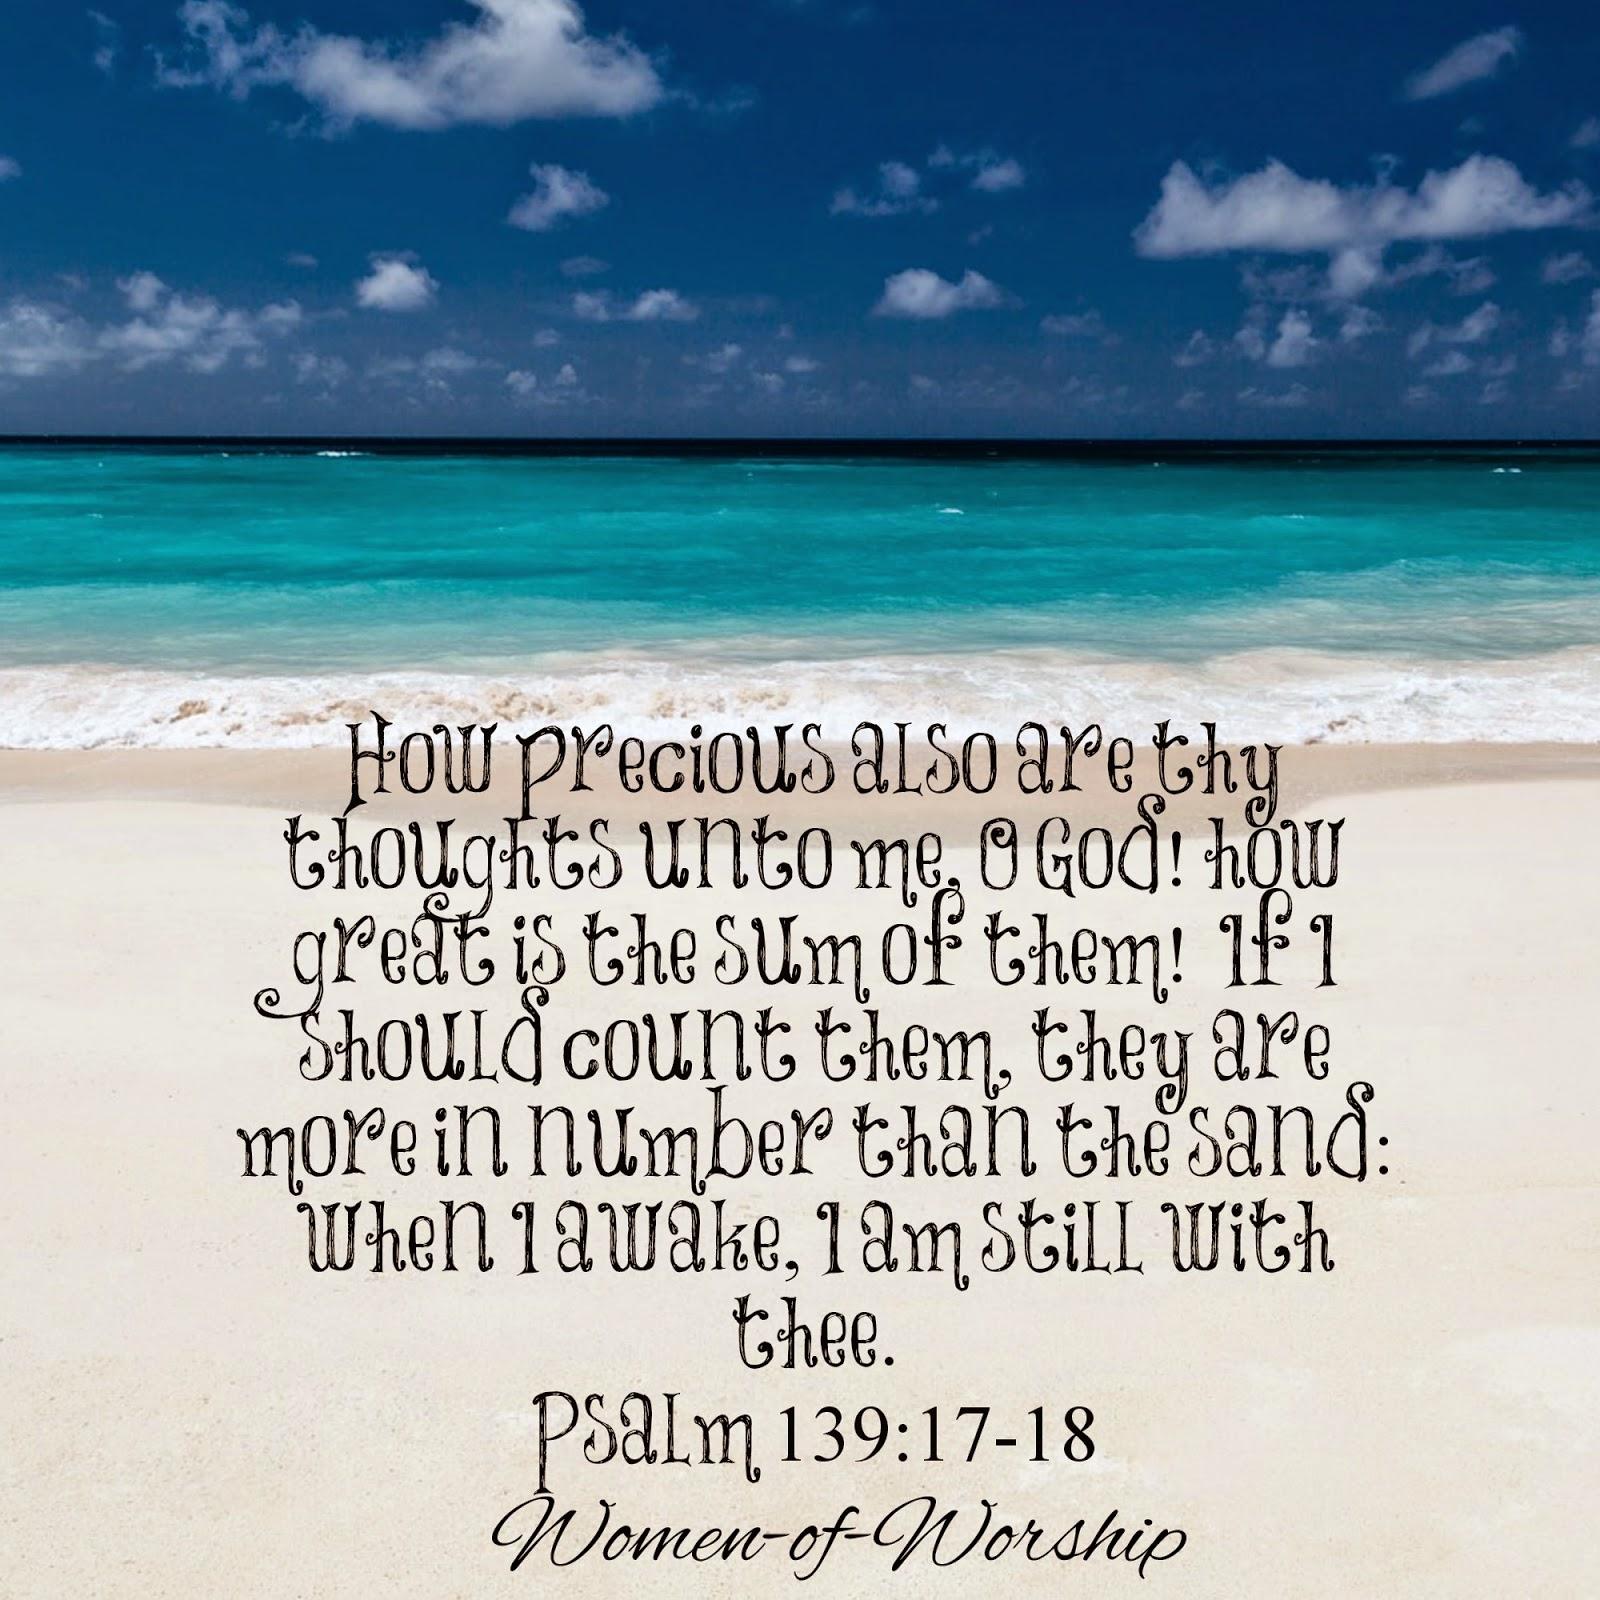 psalm 1 23 32 Psalm 23 psalm 25 psalm 30 psalm 32 psalms 42-43 psalm 51 psalm 56 psalm 73 psalm 95 psalm 96 psalm 110 psalm 111 psalm 116 psalm 121 psalm 1.